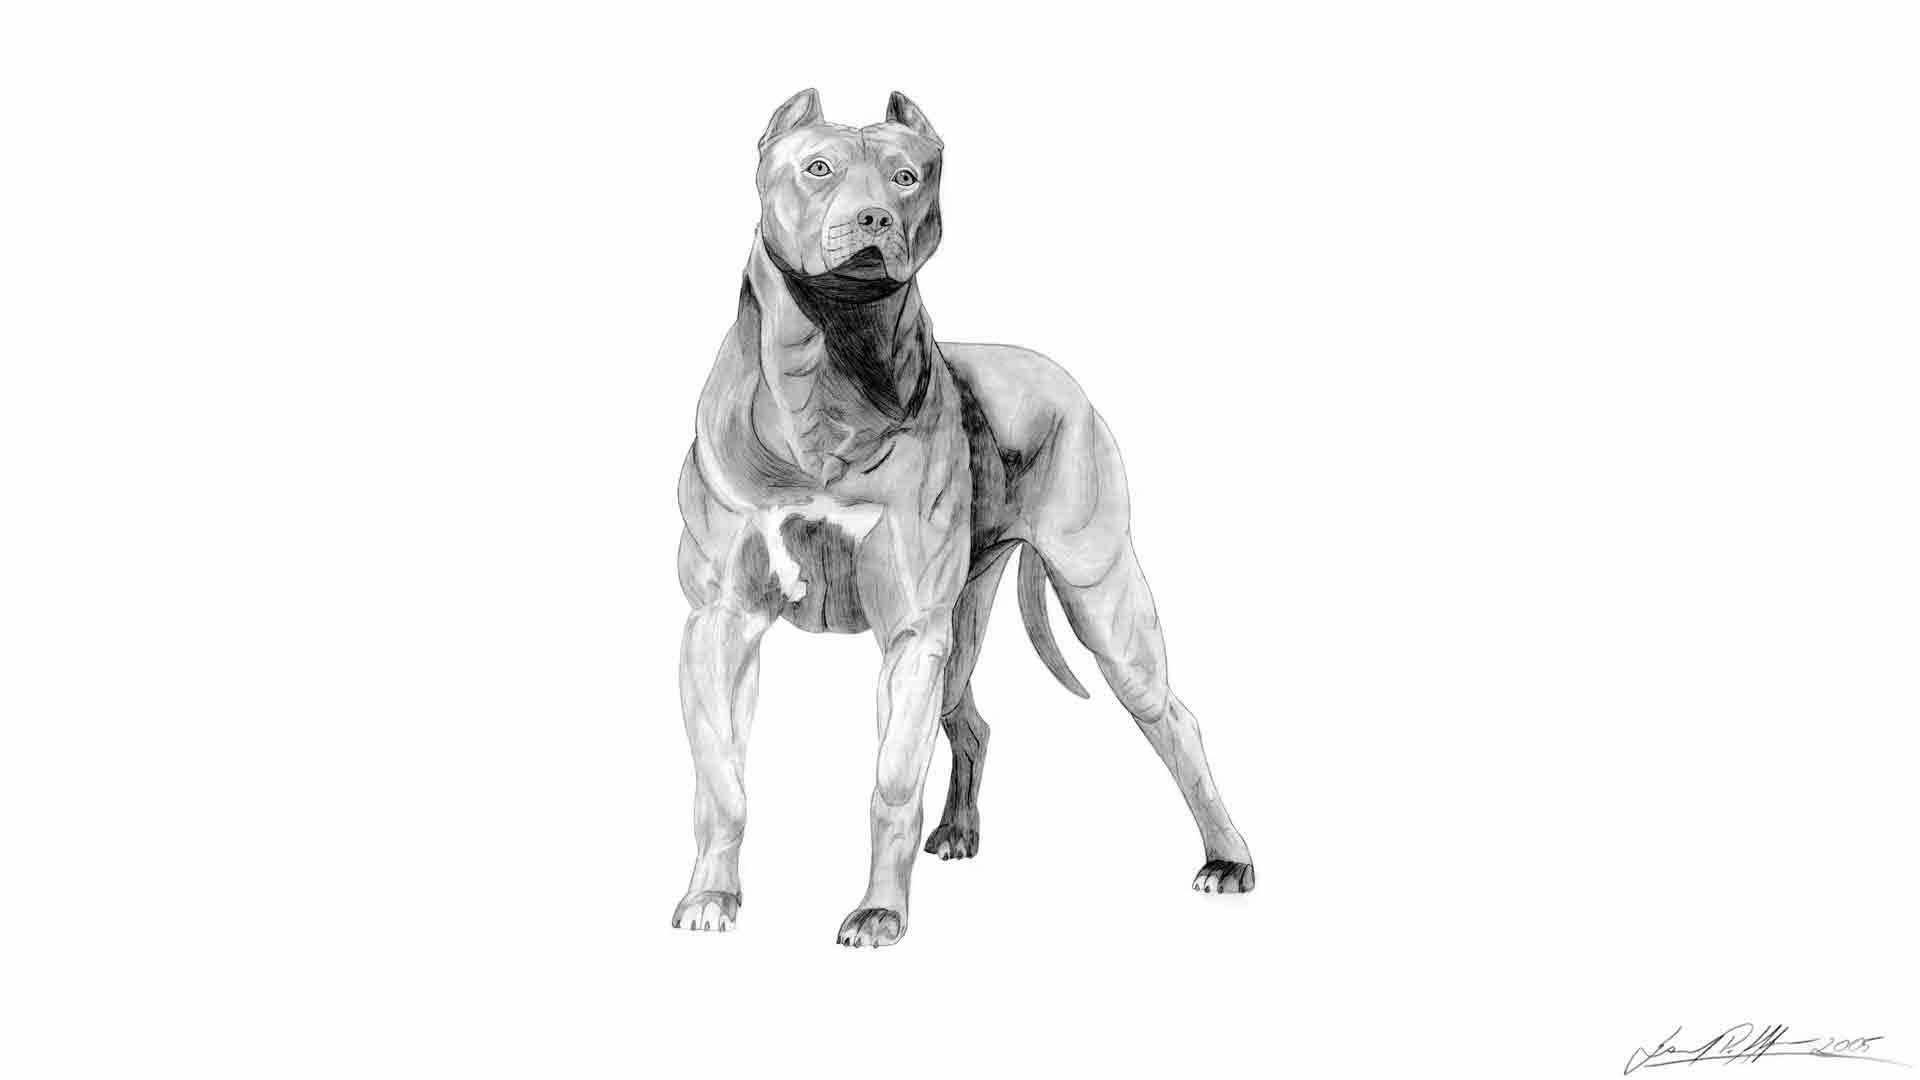 Pitbull Dog Wallpapers #6975118